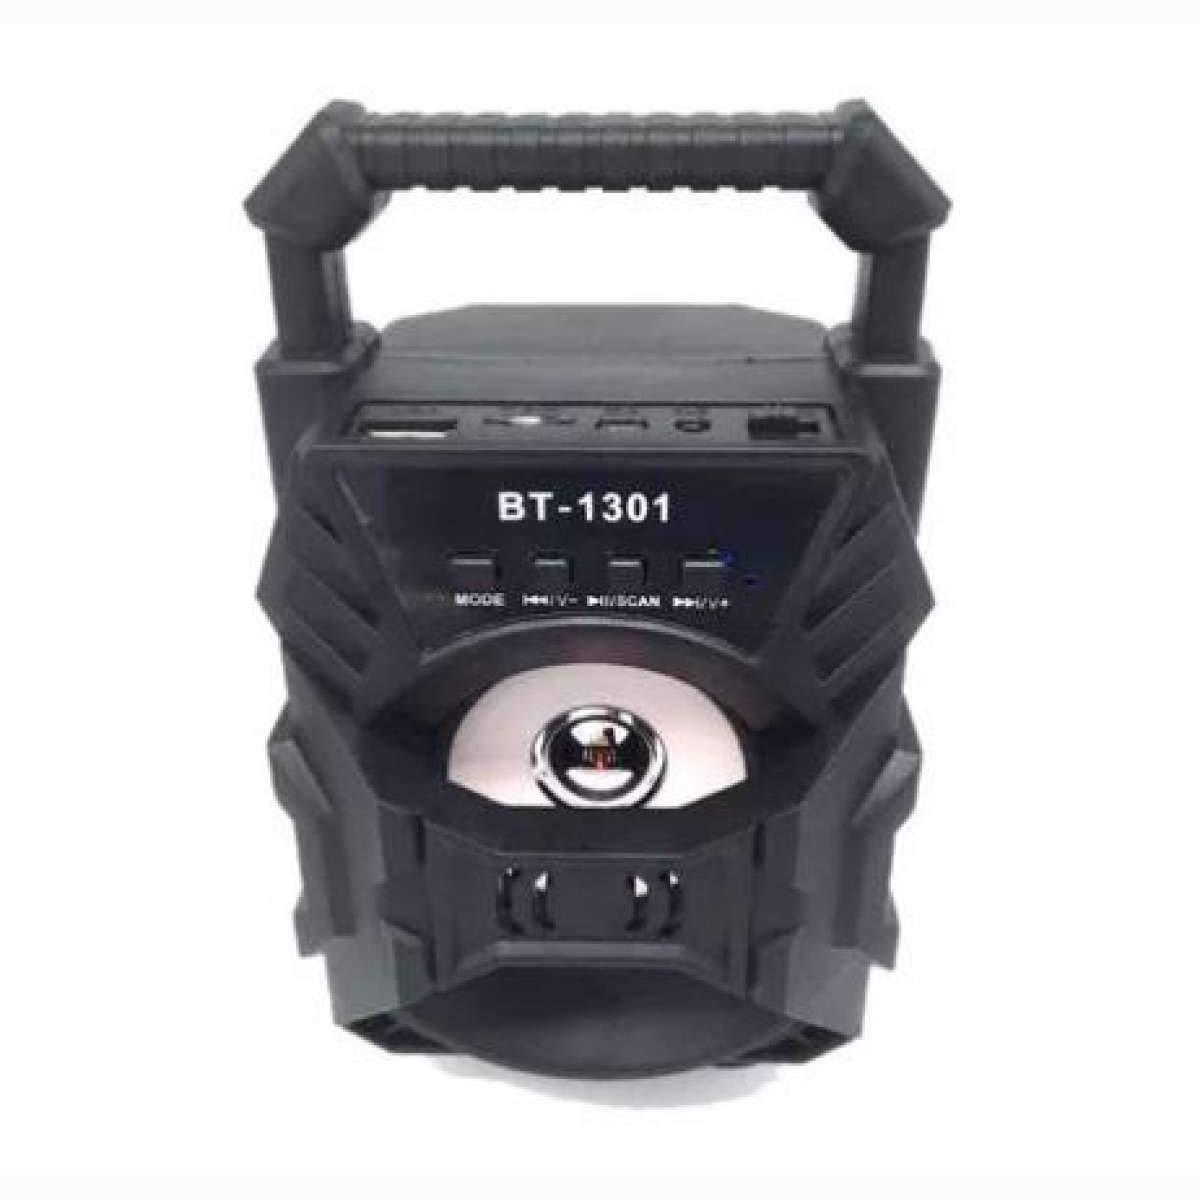 SPEAKER BLUETOOTH FOR MP3 & MOBILE & FM & SD CARD USB BT 1301/BT1305 ,Speakers